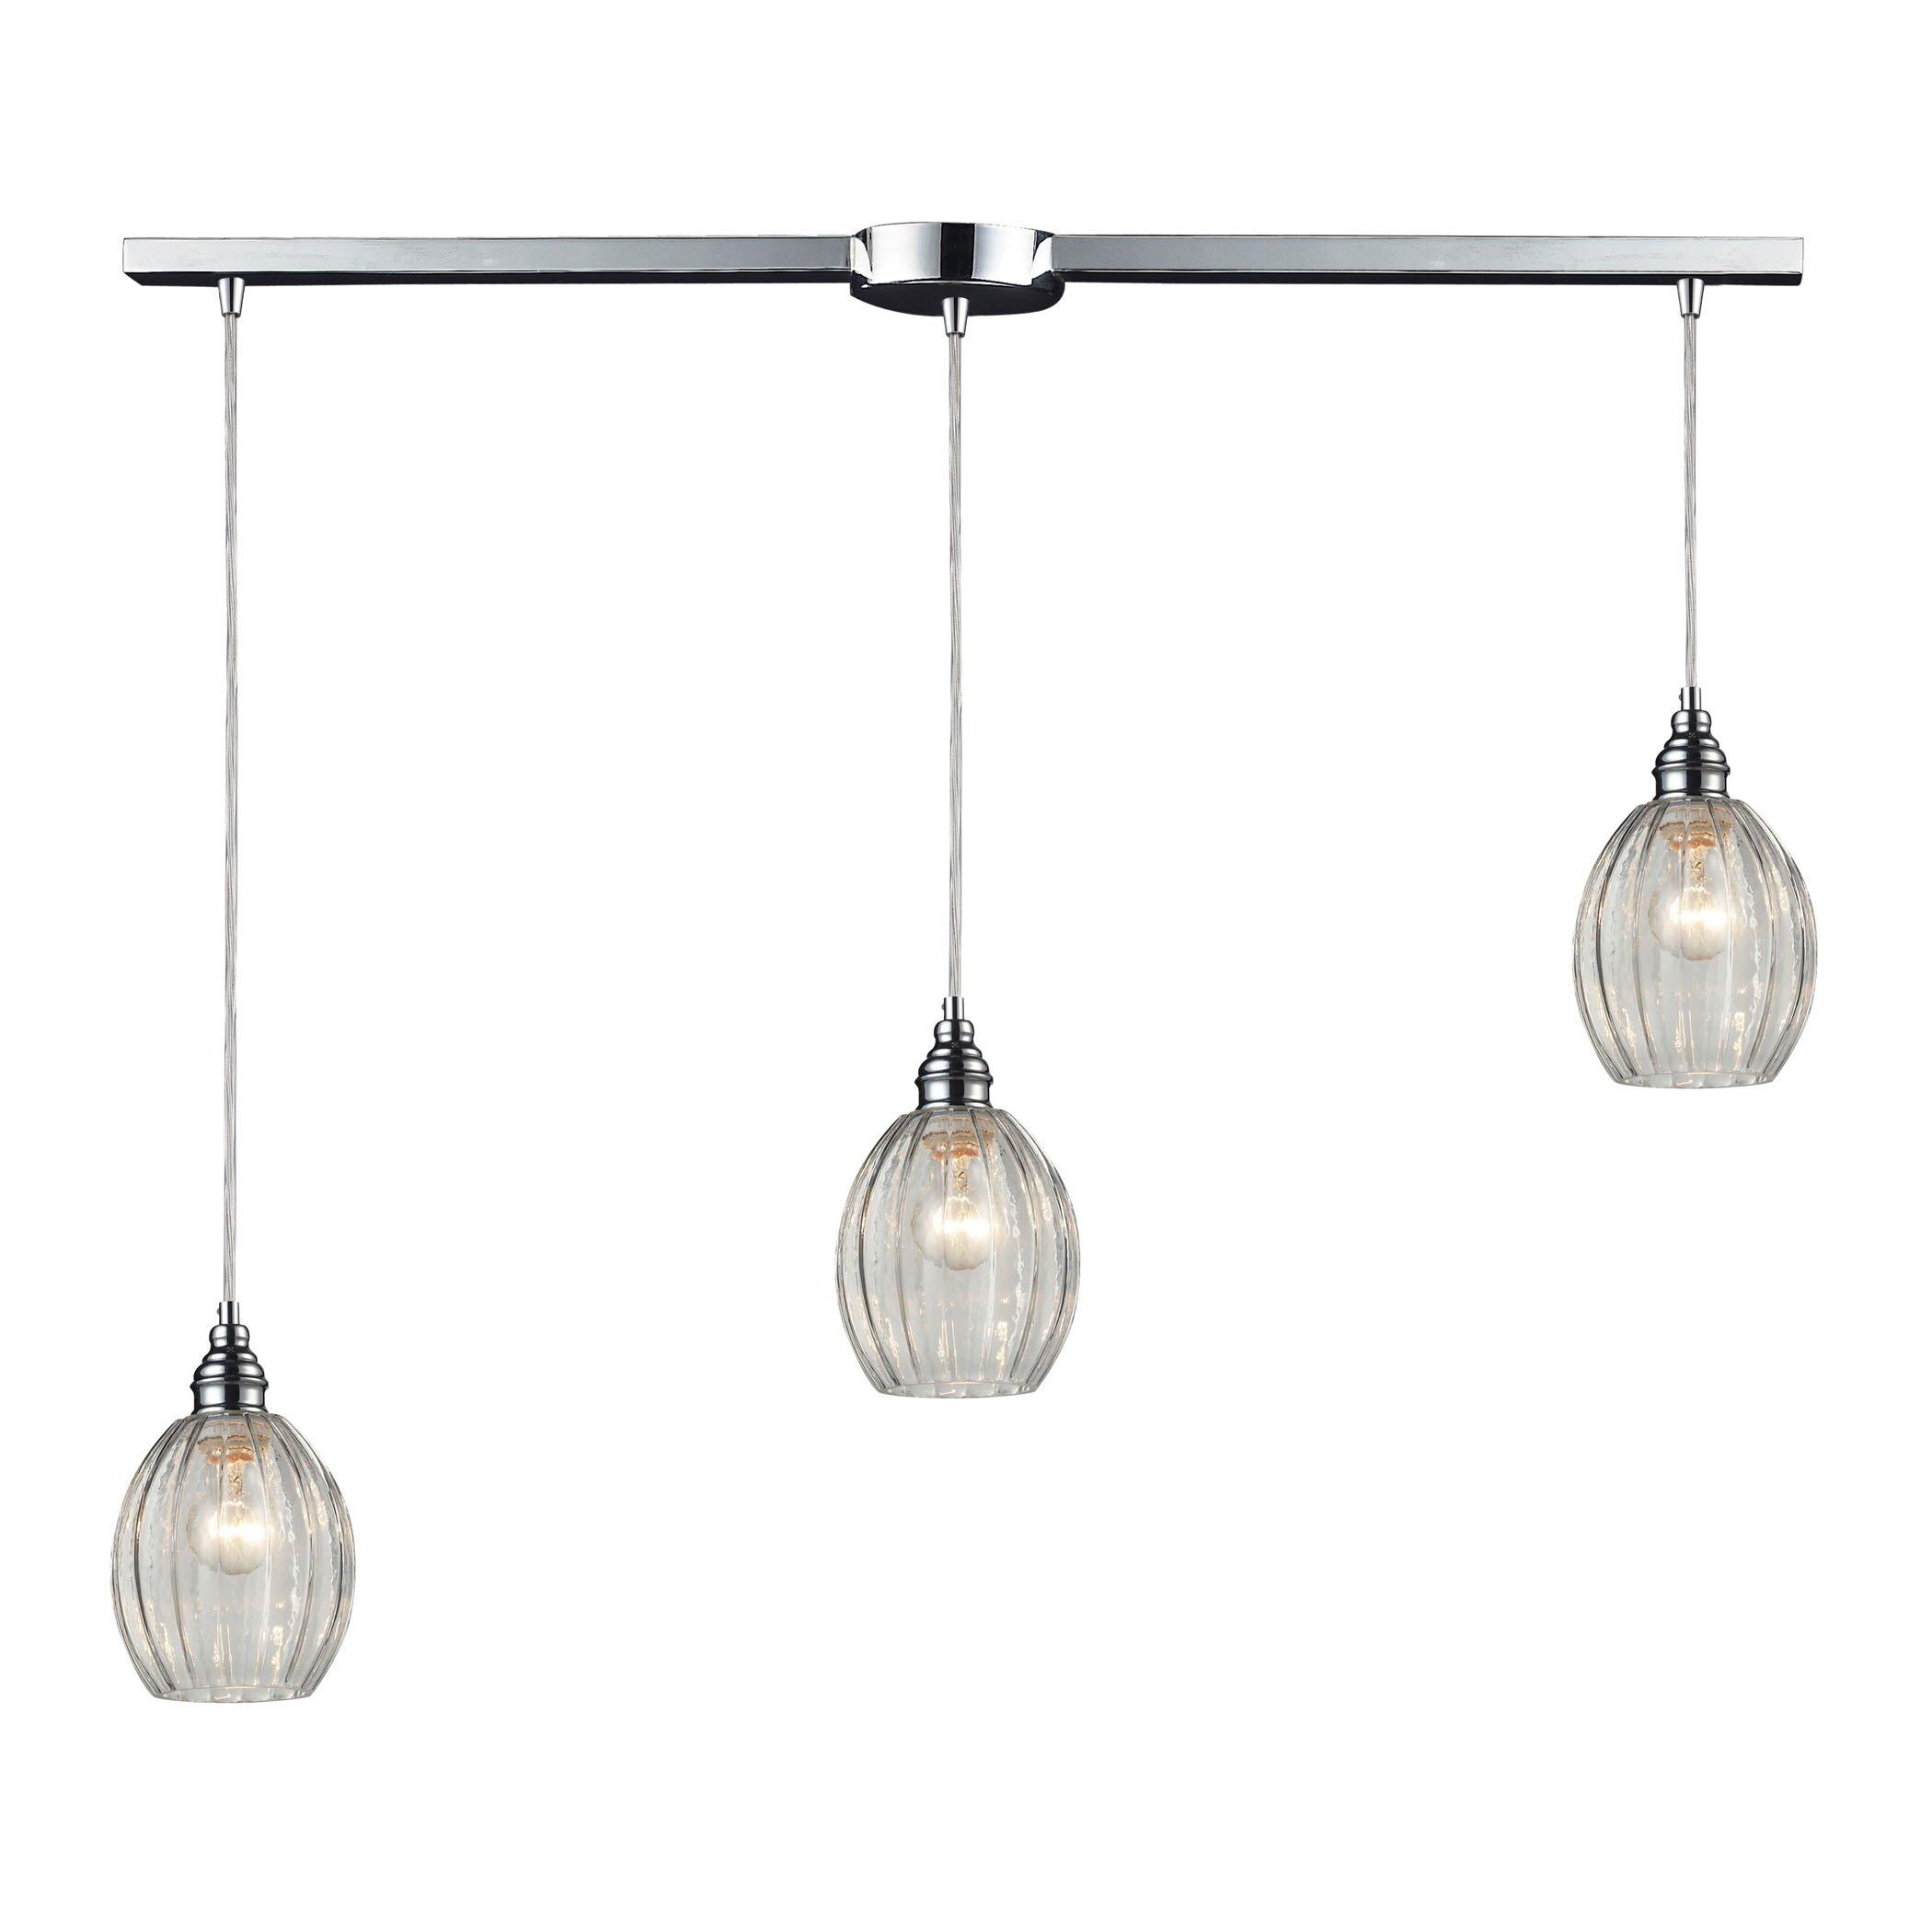 Danica 3 light kitchen island pendant wayfair for Kitchen island lighting pendants